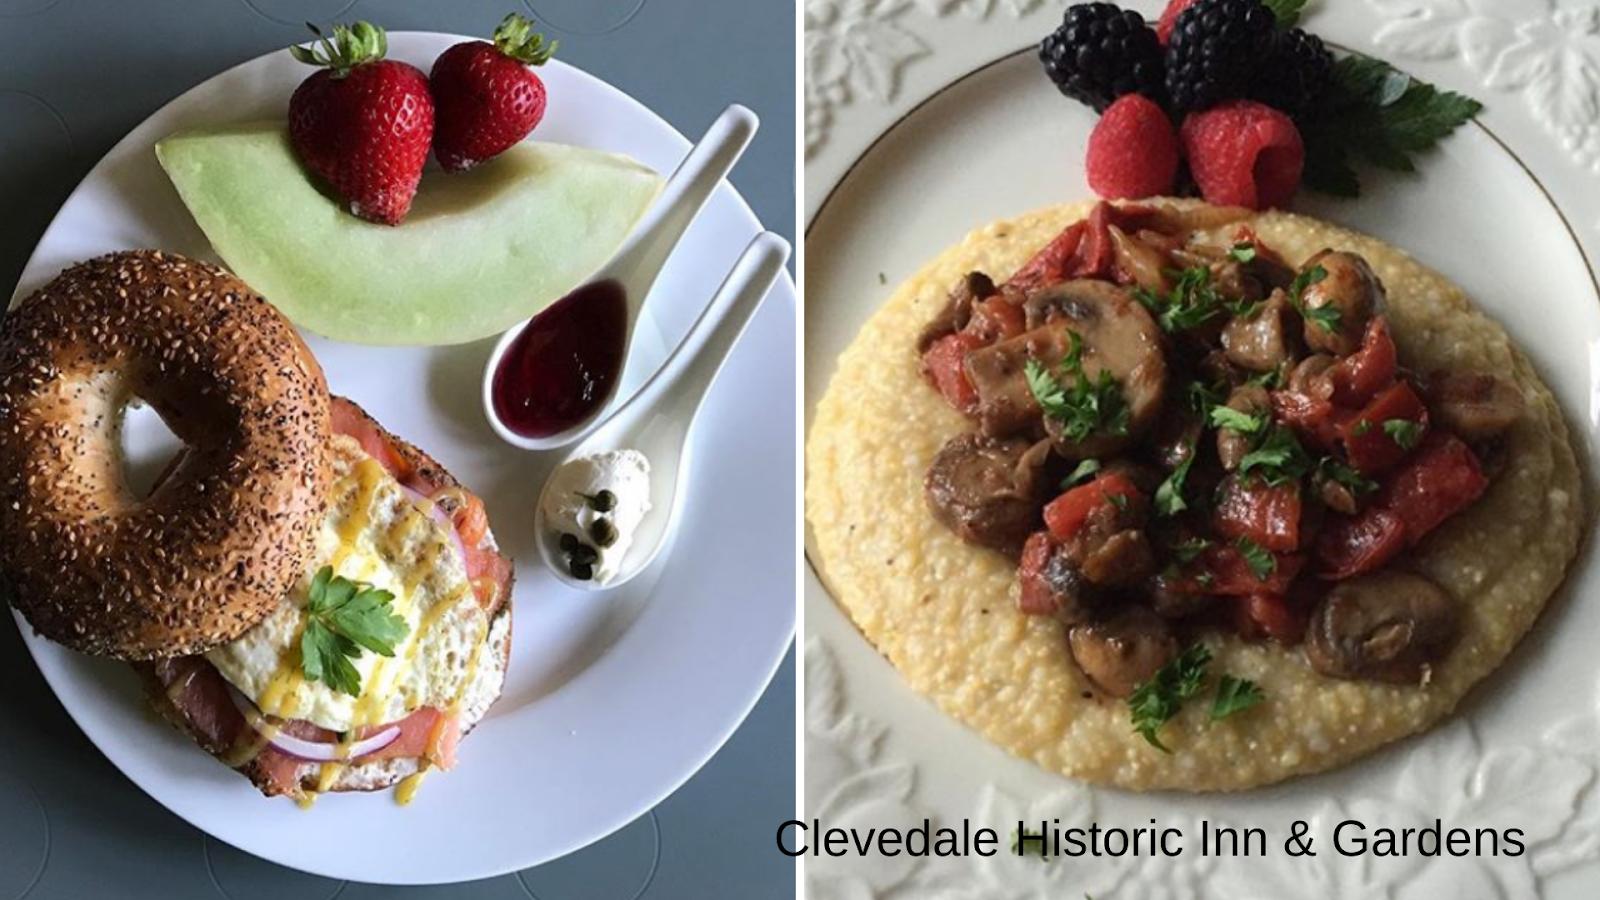 GbA6kH-VratlPE37FBdZSMlyVmD9jiNnOvAgxe0v7zgIh9GzFIh6Sp0A4udRsKzfH4IwsTFMW1rFGlJJK1clPNurvxTwZlsV1pofv9Rtgd2NkKogLhuwZ0sVarAWnLqM8gF9BA6F Holiday Breakfast Inspiration from Two of the South's Finest Black-owned Inns